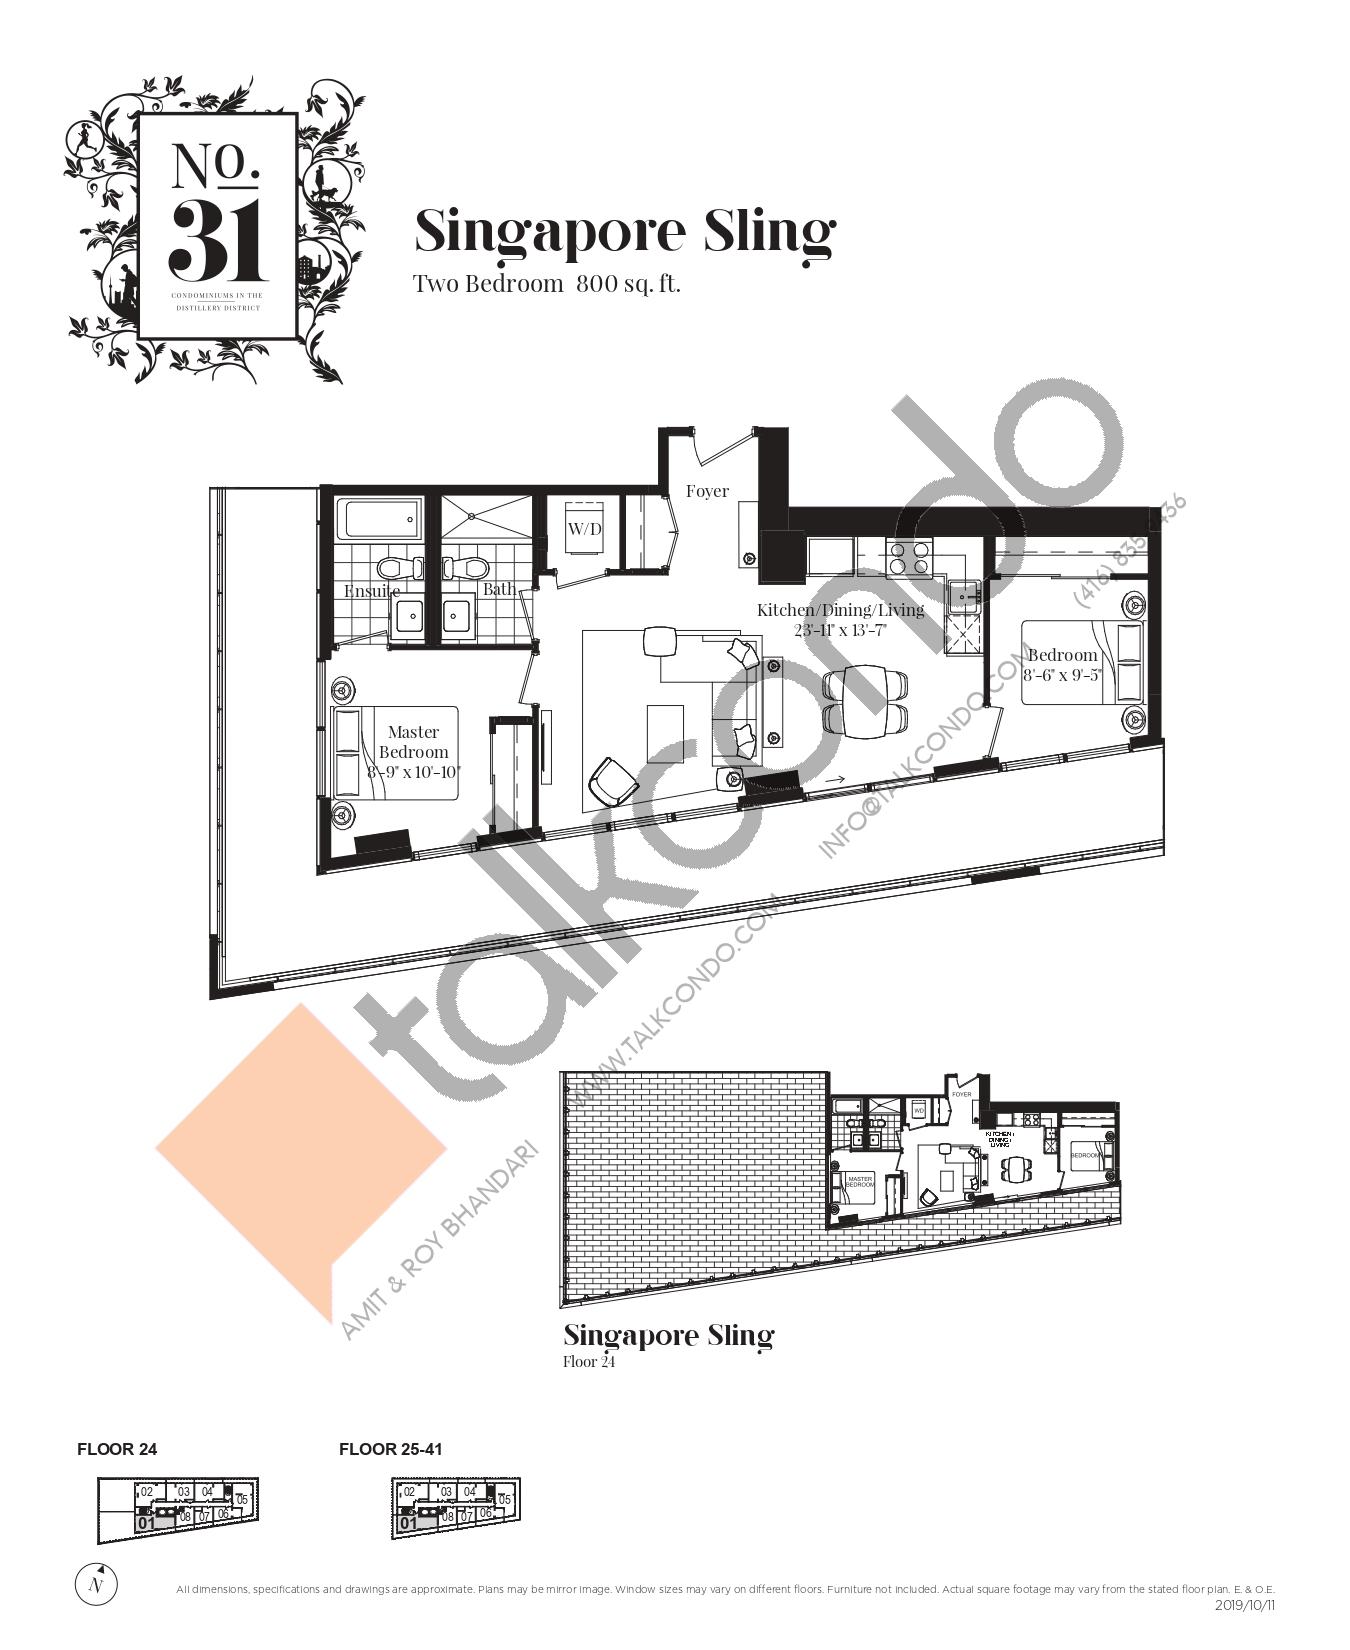 Singapore Sling Floor Plan at No. 31 Condos - 800 sq.ft